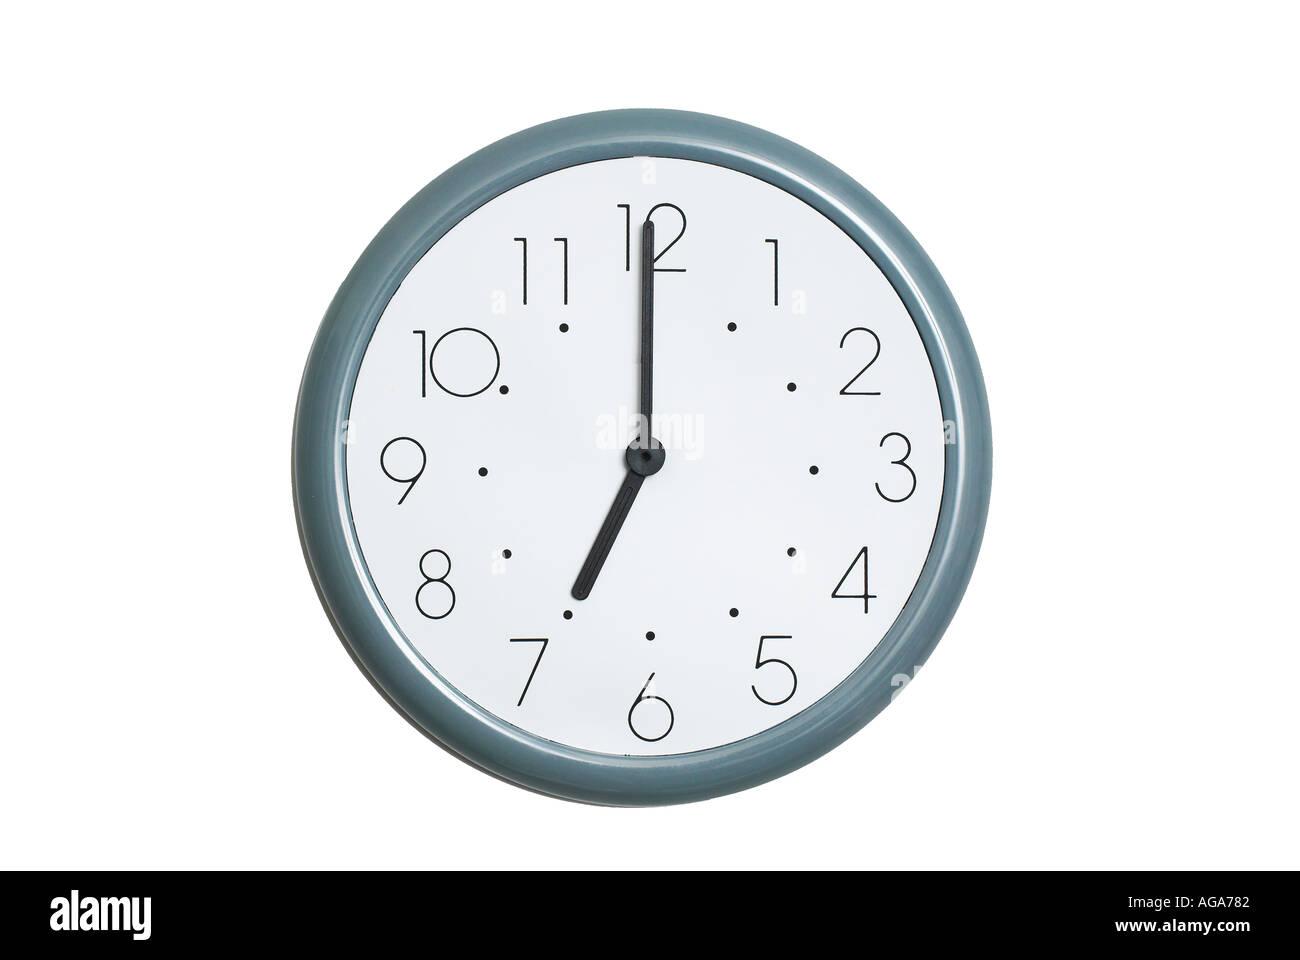 7 orologio o Immagini Stock